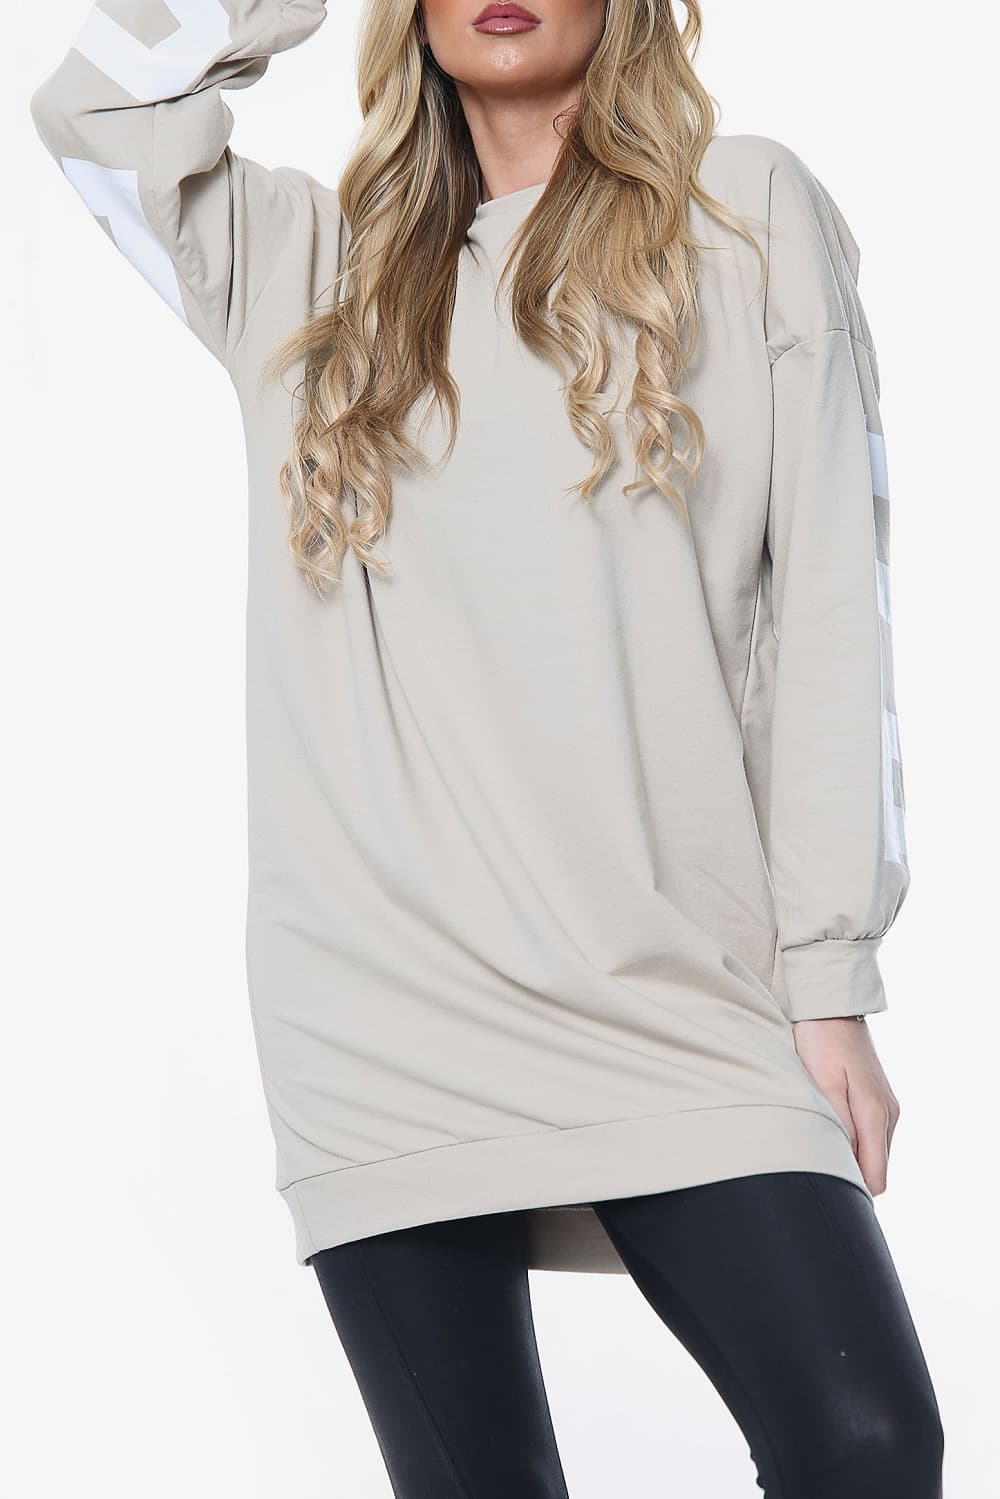 sweater dress,